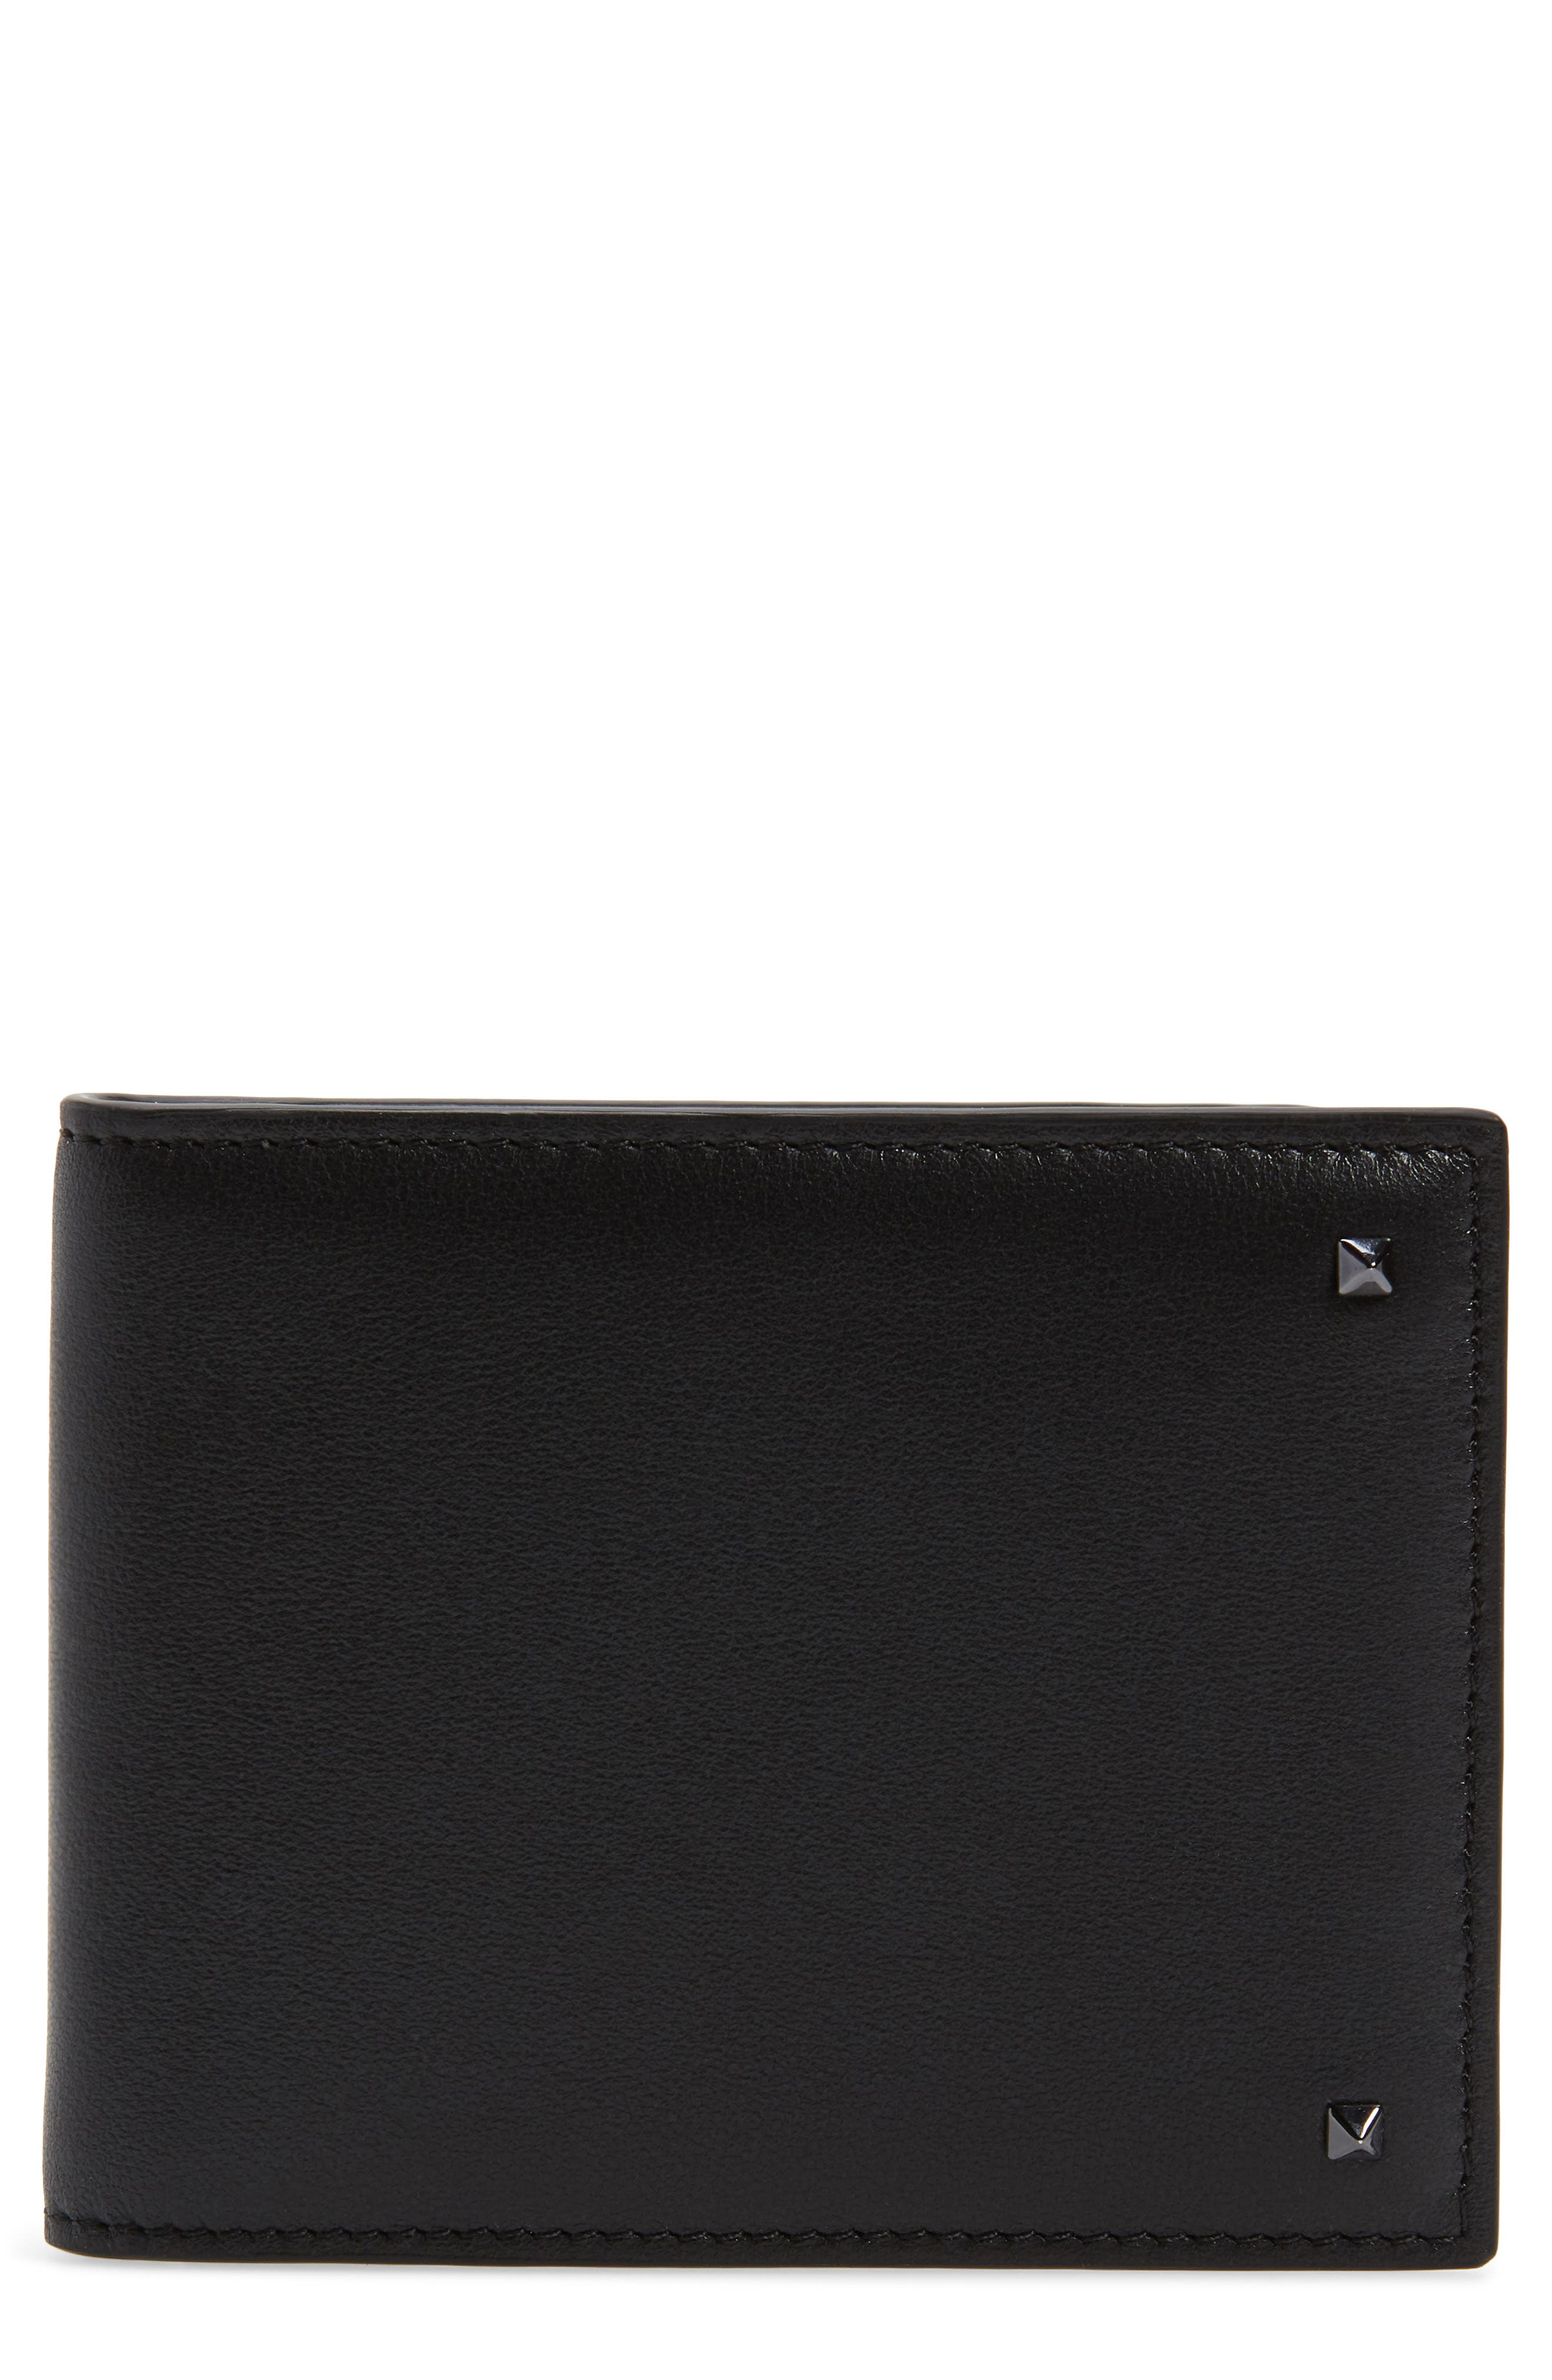 VALENTINO GARAVANI Stud Leather Money Clip Wallet